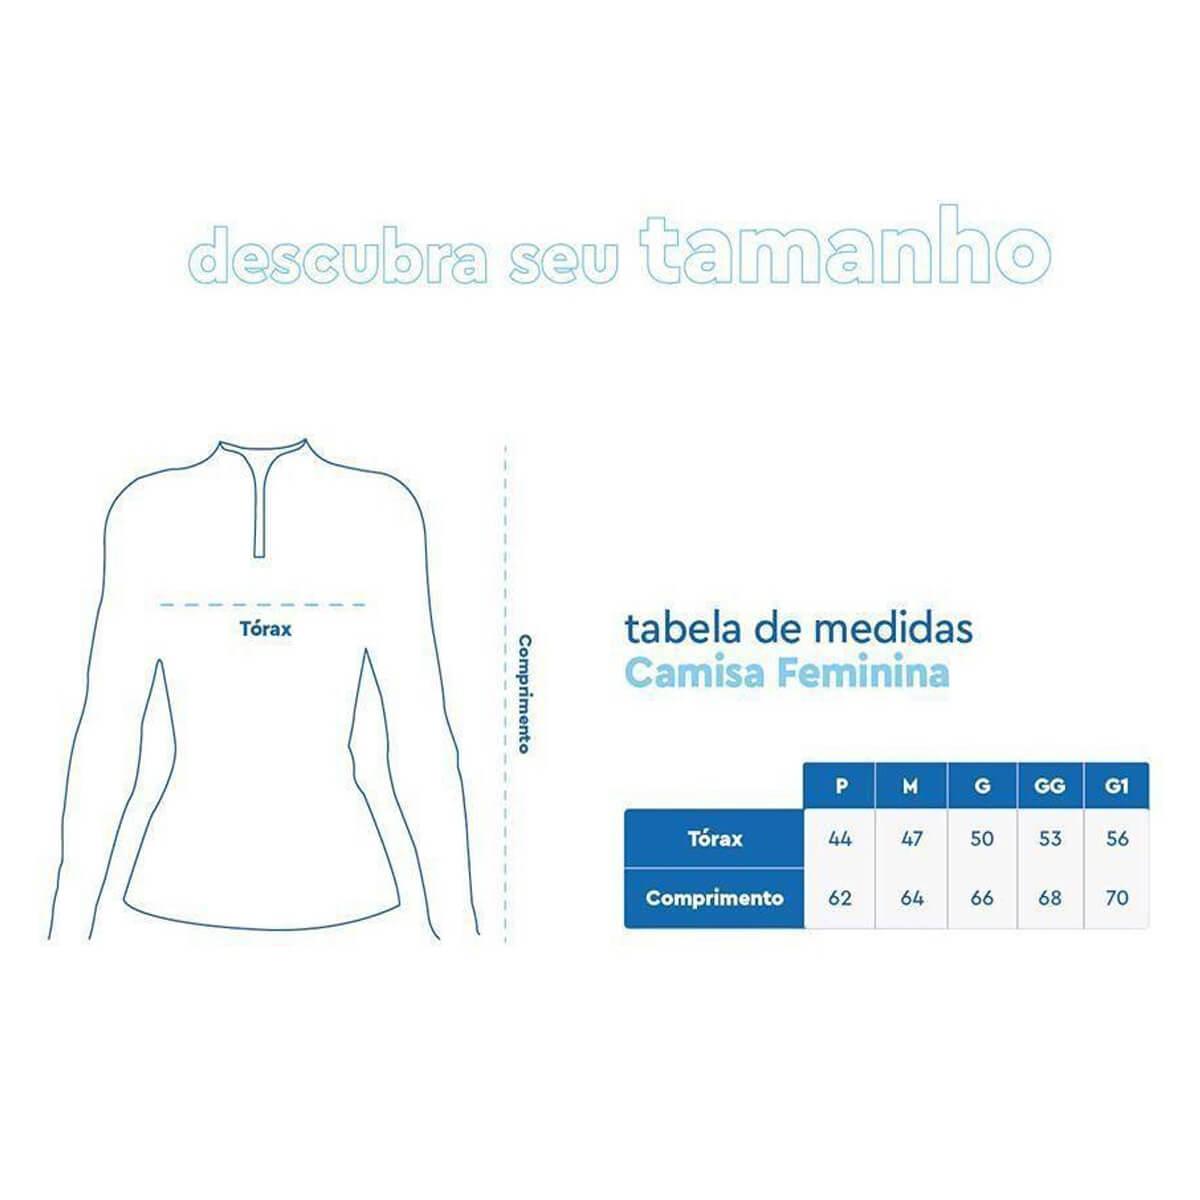 Camiseta Mar Negro Feminina 2021 Tucunaré Azul  - Pró Pesca Shop